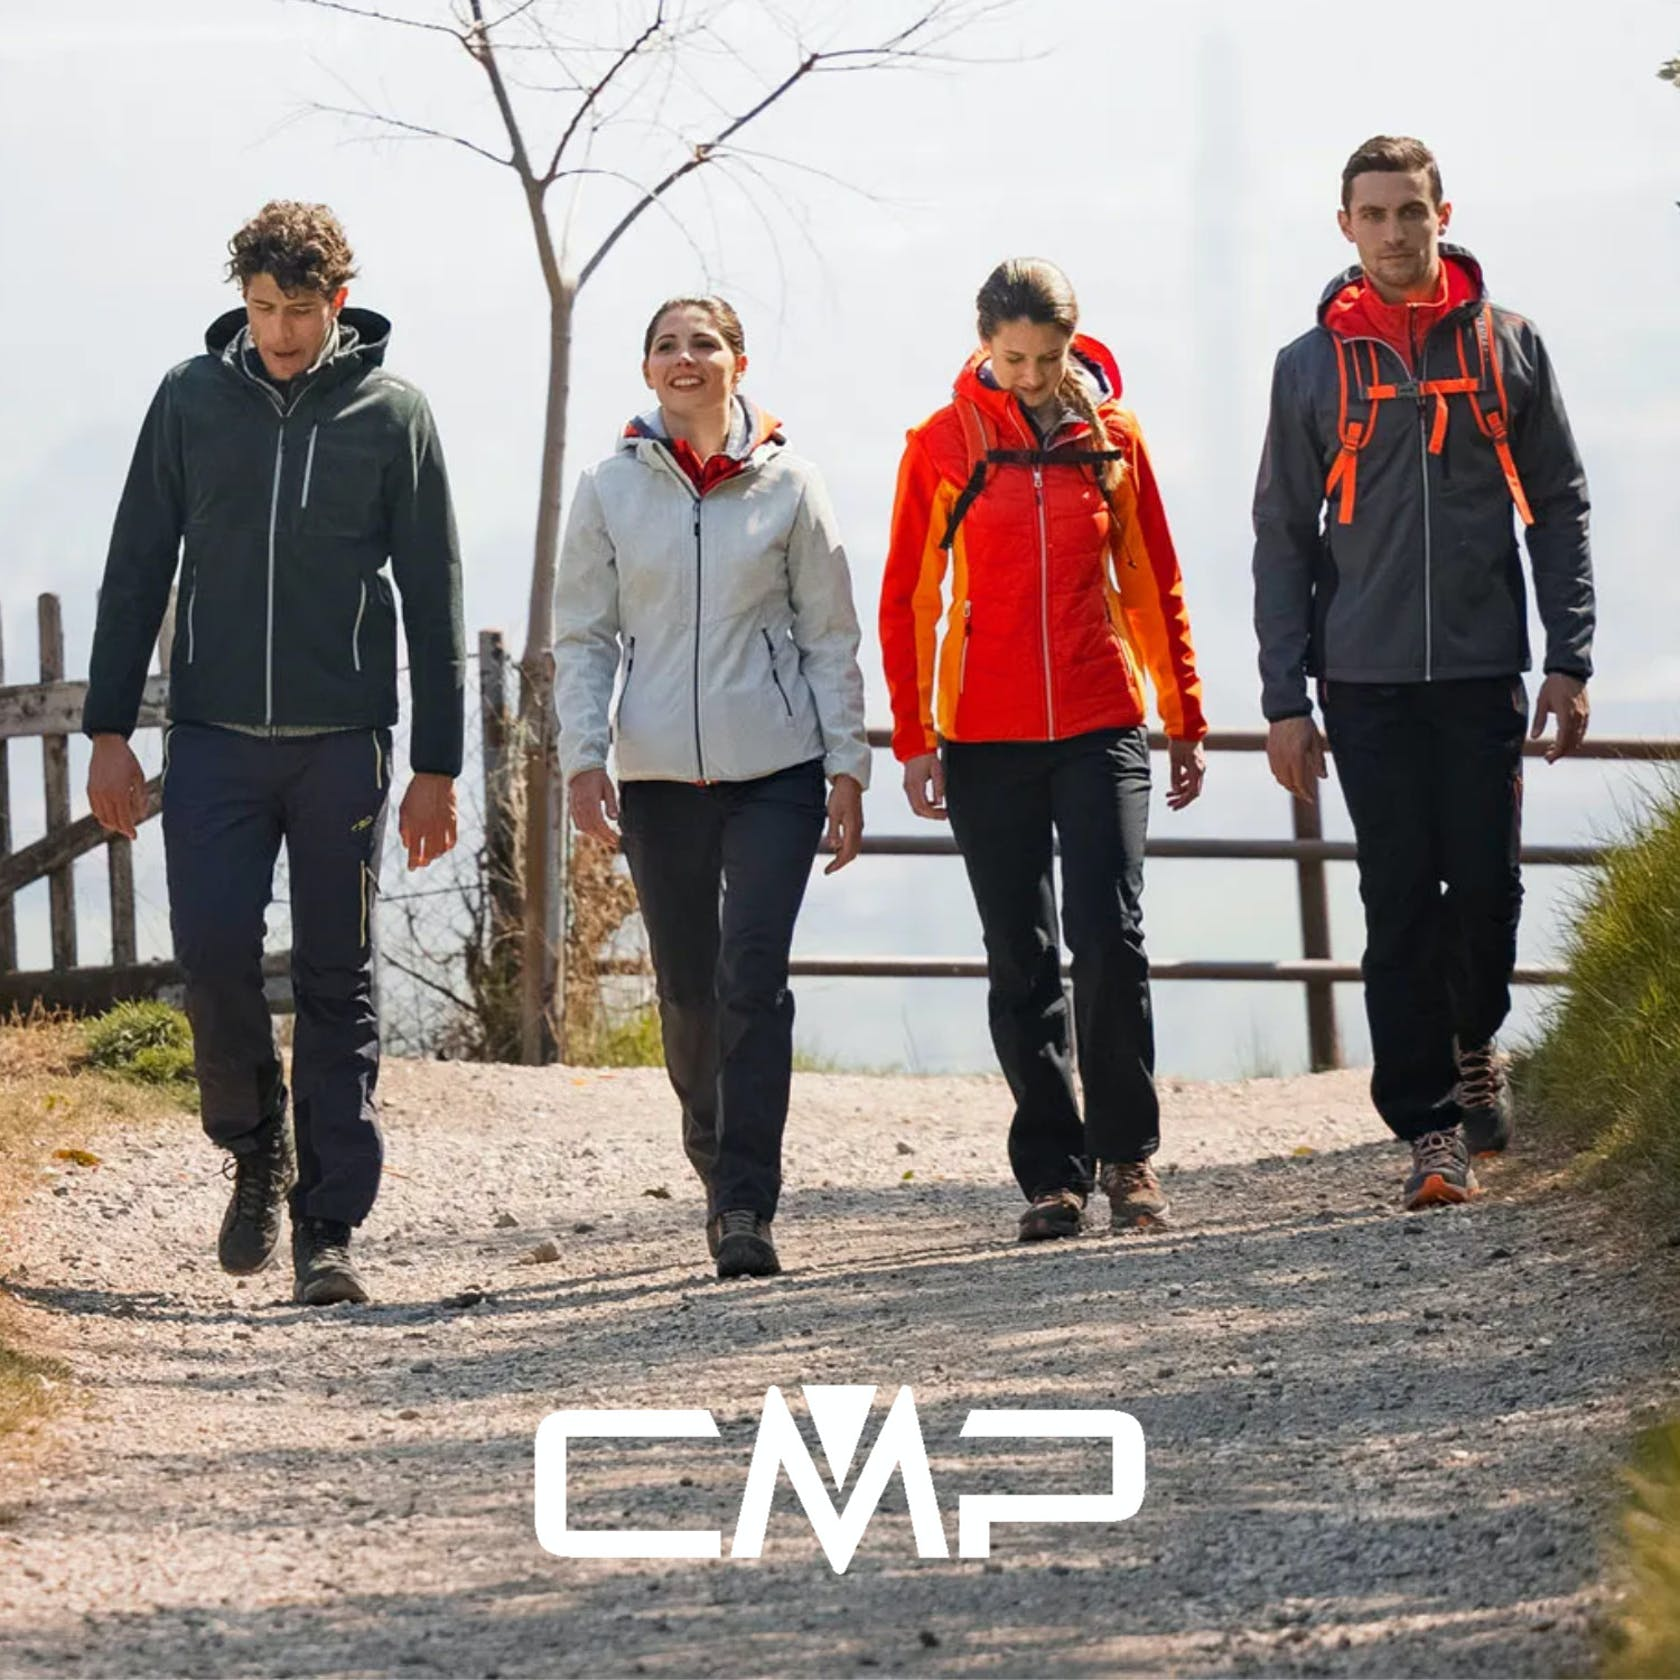 Bekleidung CMP Onlineshop